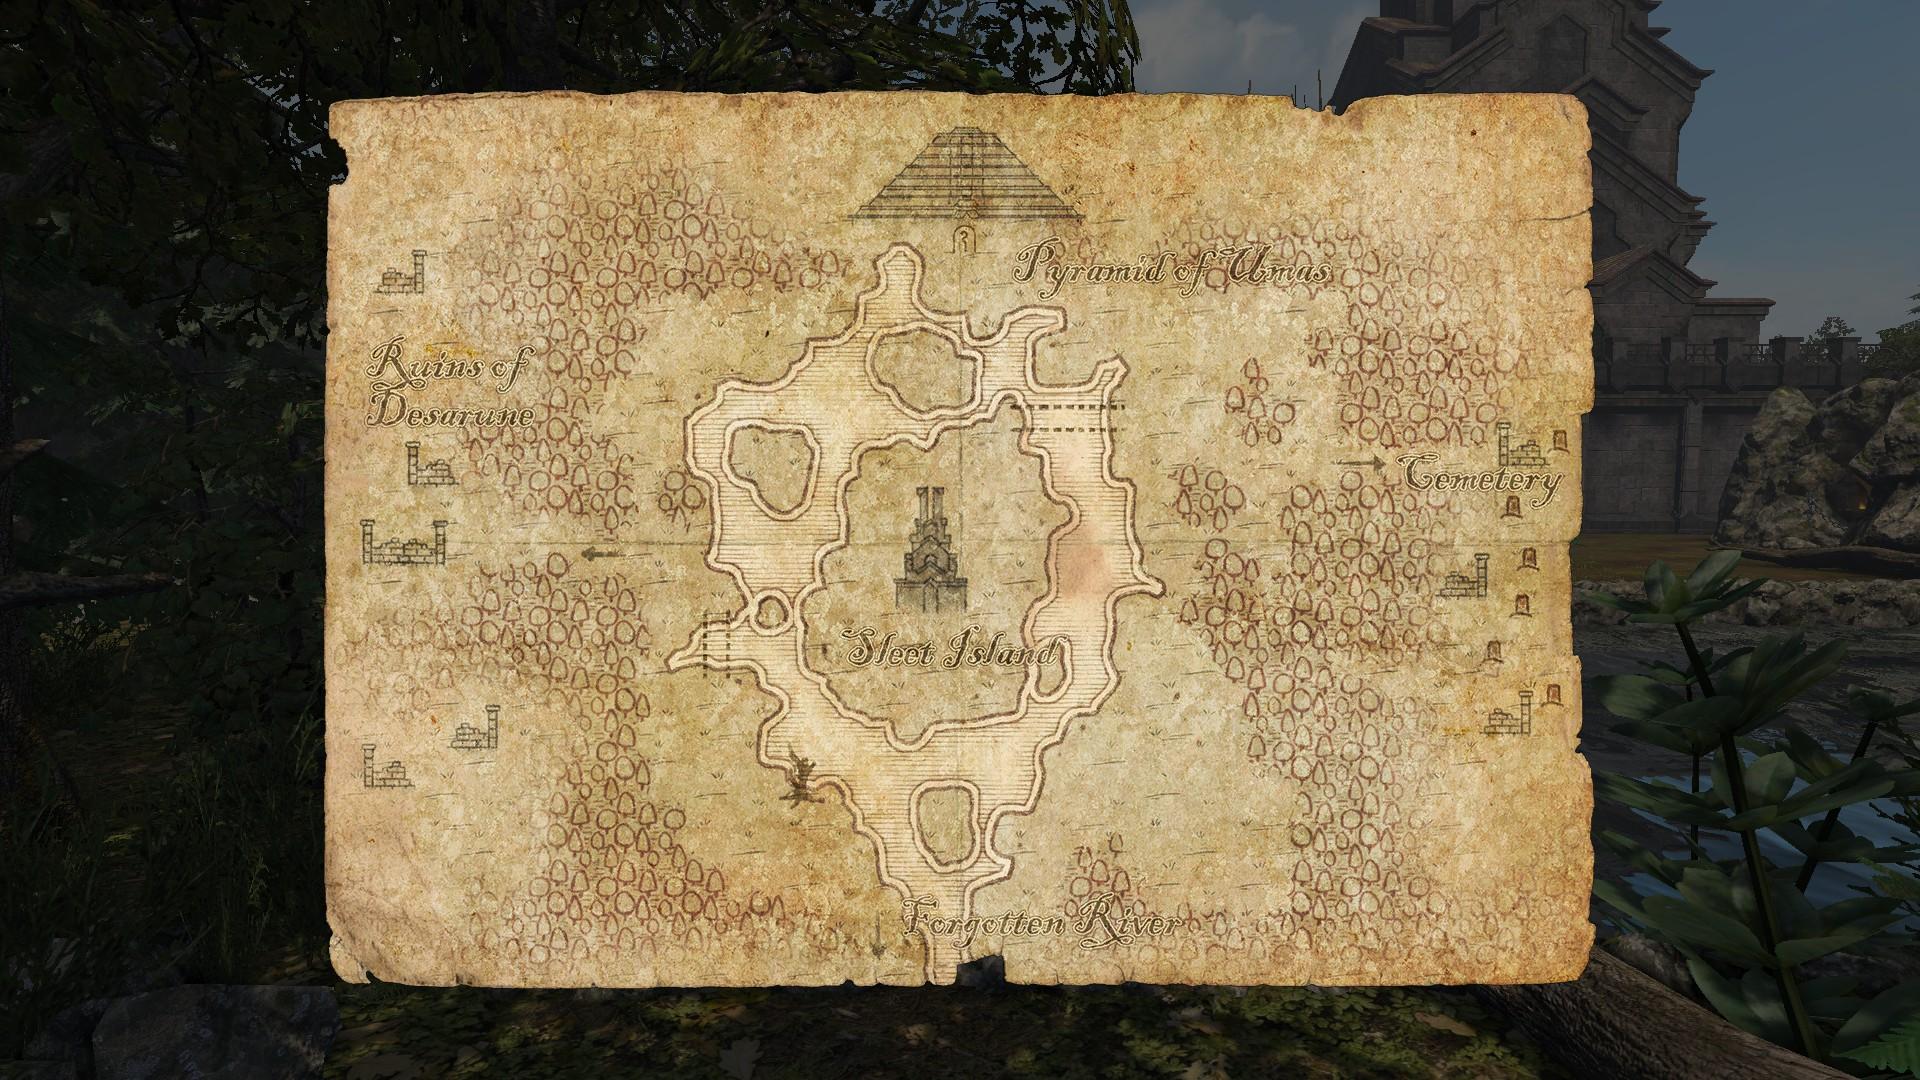 Legend of grimrock 2 ten tips for new returning players legend of grimrock 2 map publicscrutiny Images